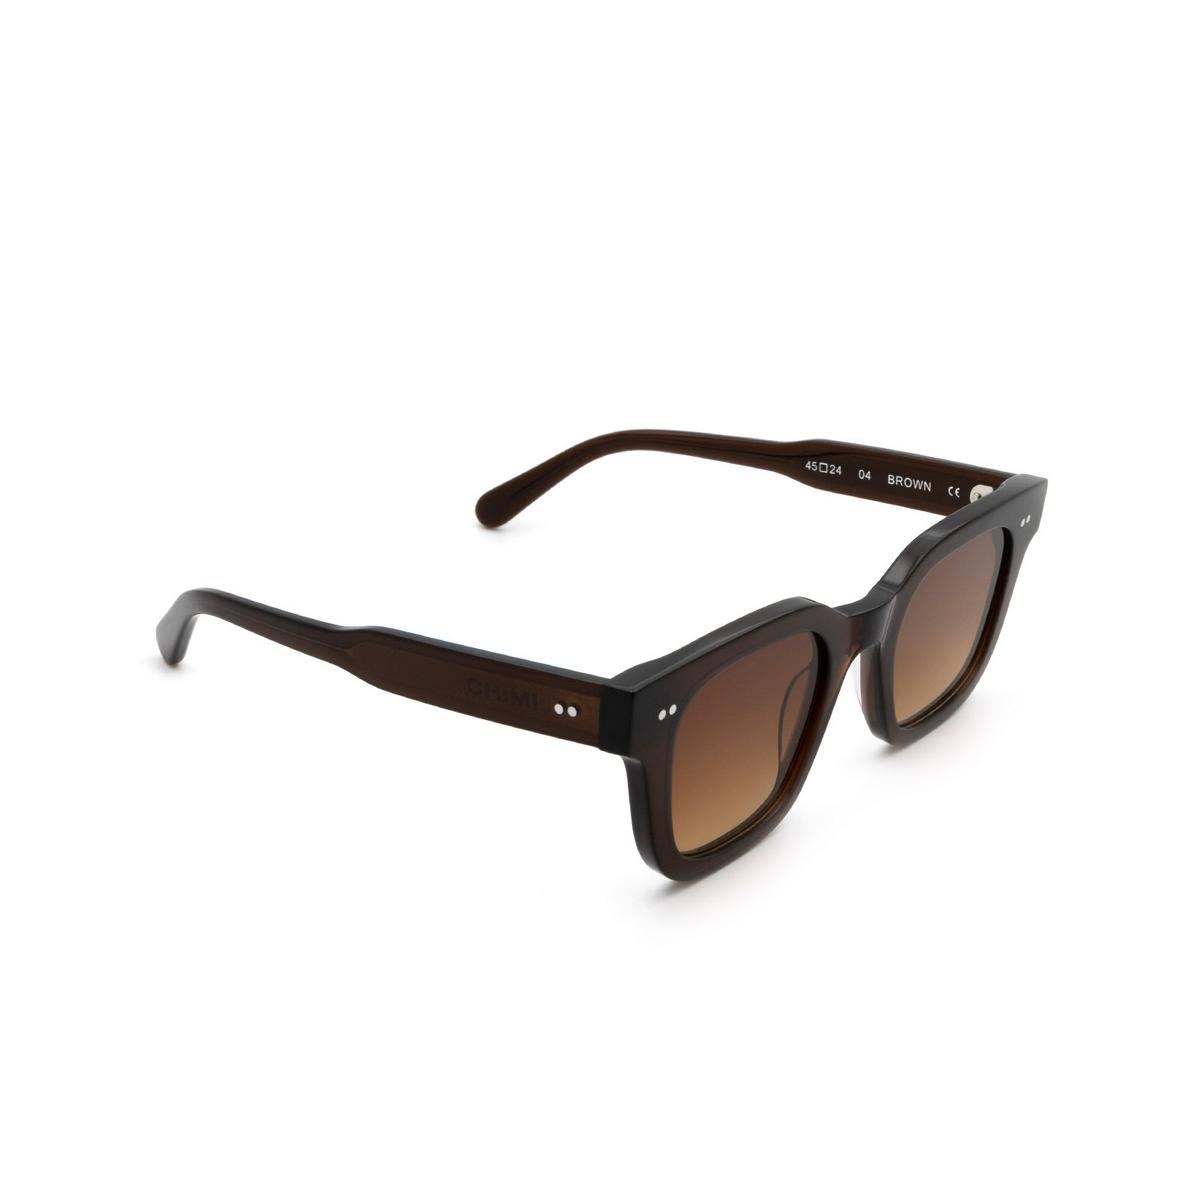 Chimi® Square Sunglasses: 04 color Brown - three-quarters view.